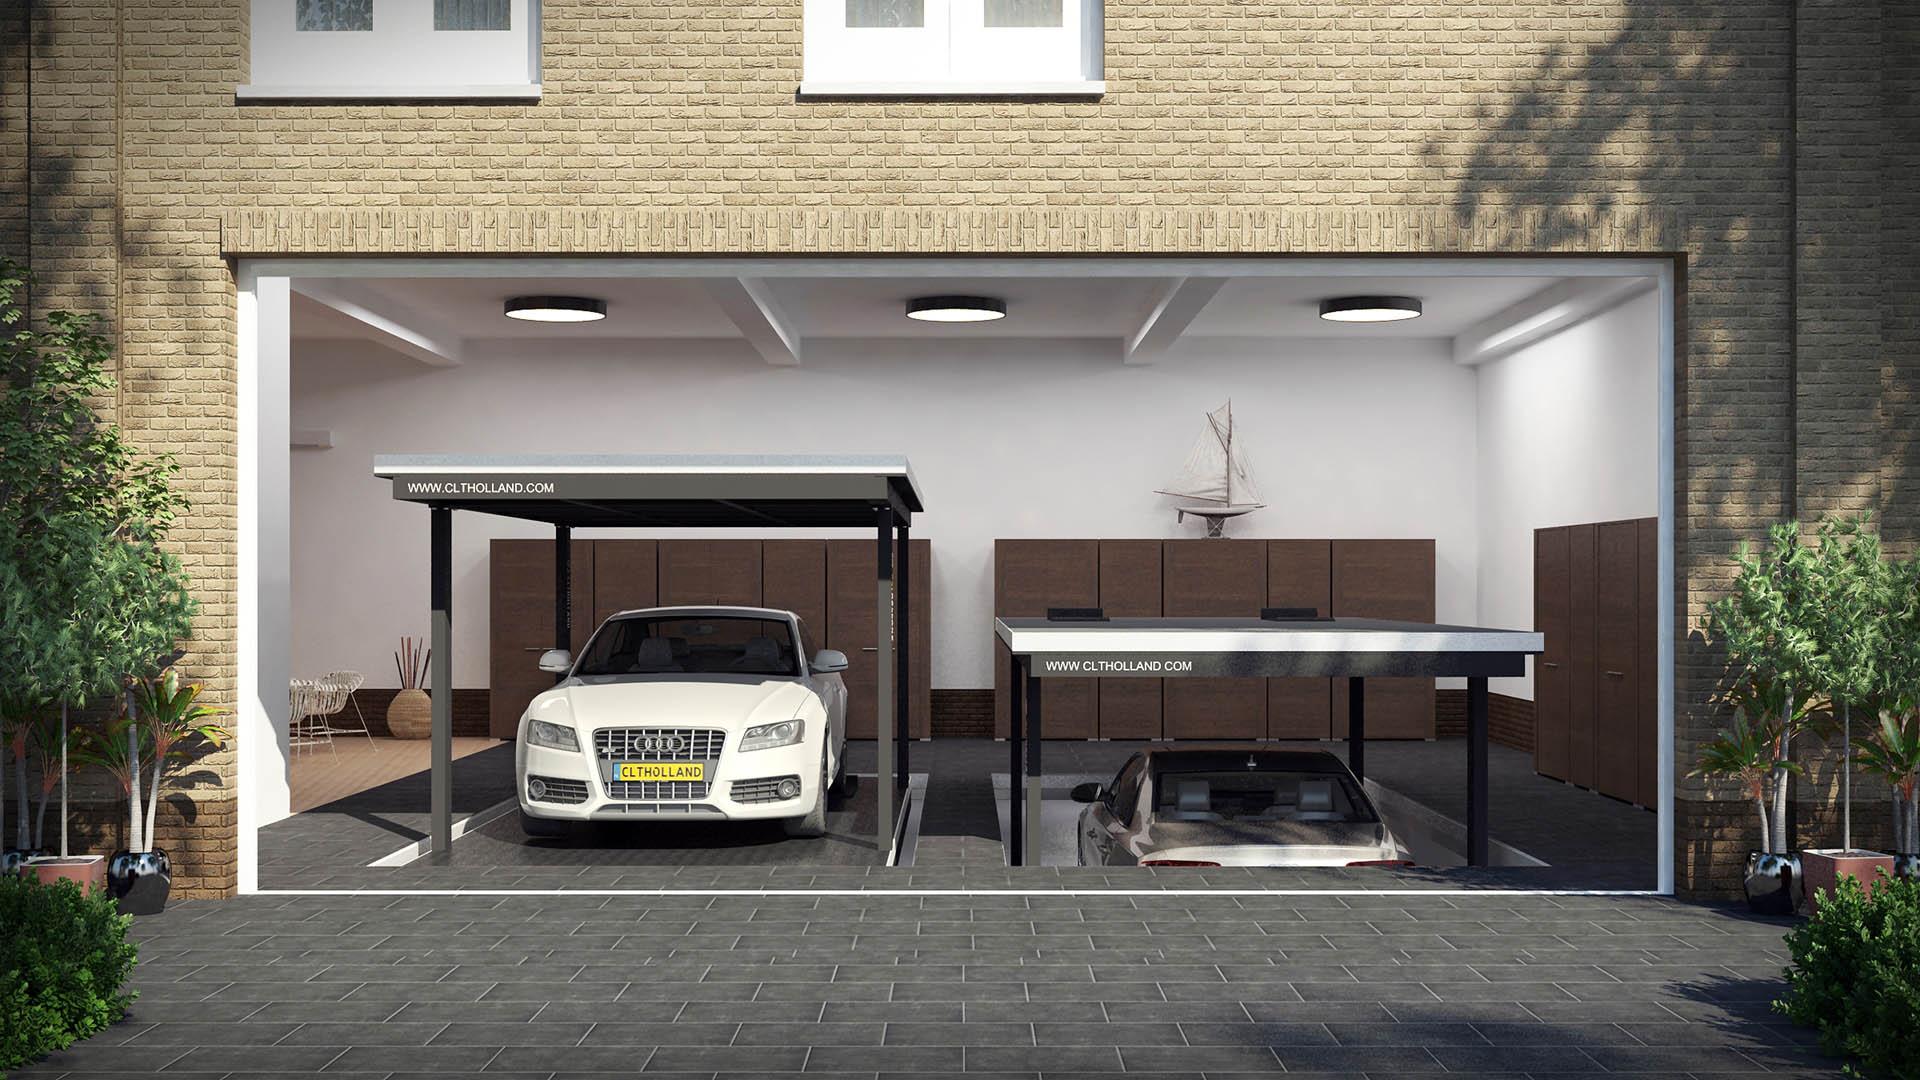 CLT Holland - dubbele Down Parker - Situatie inbouw in garage